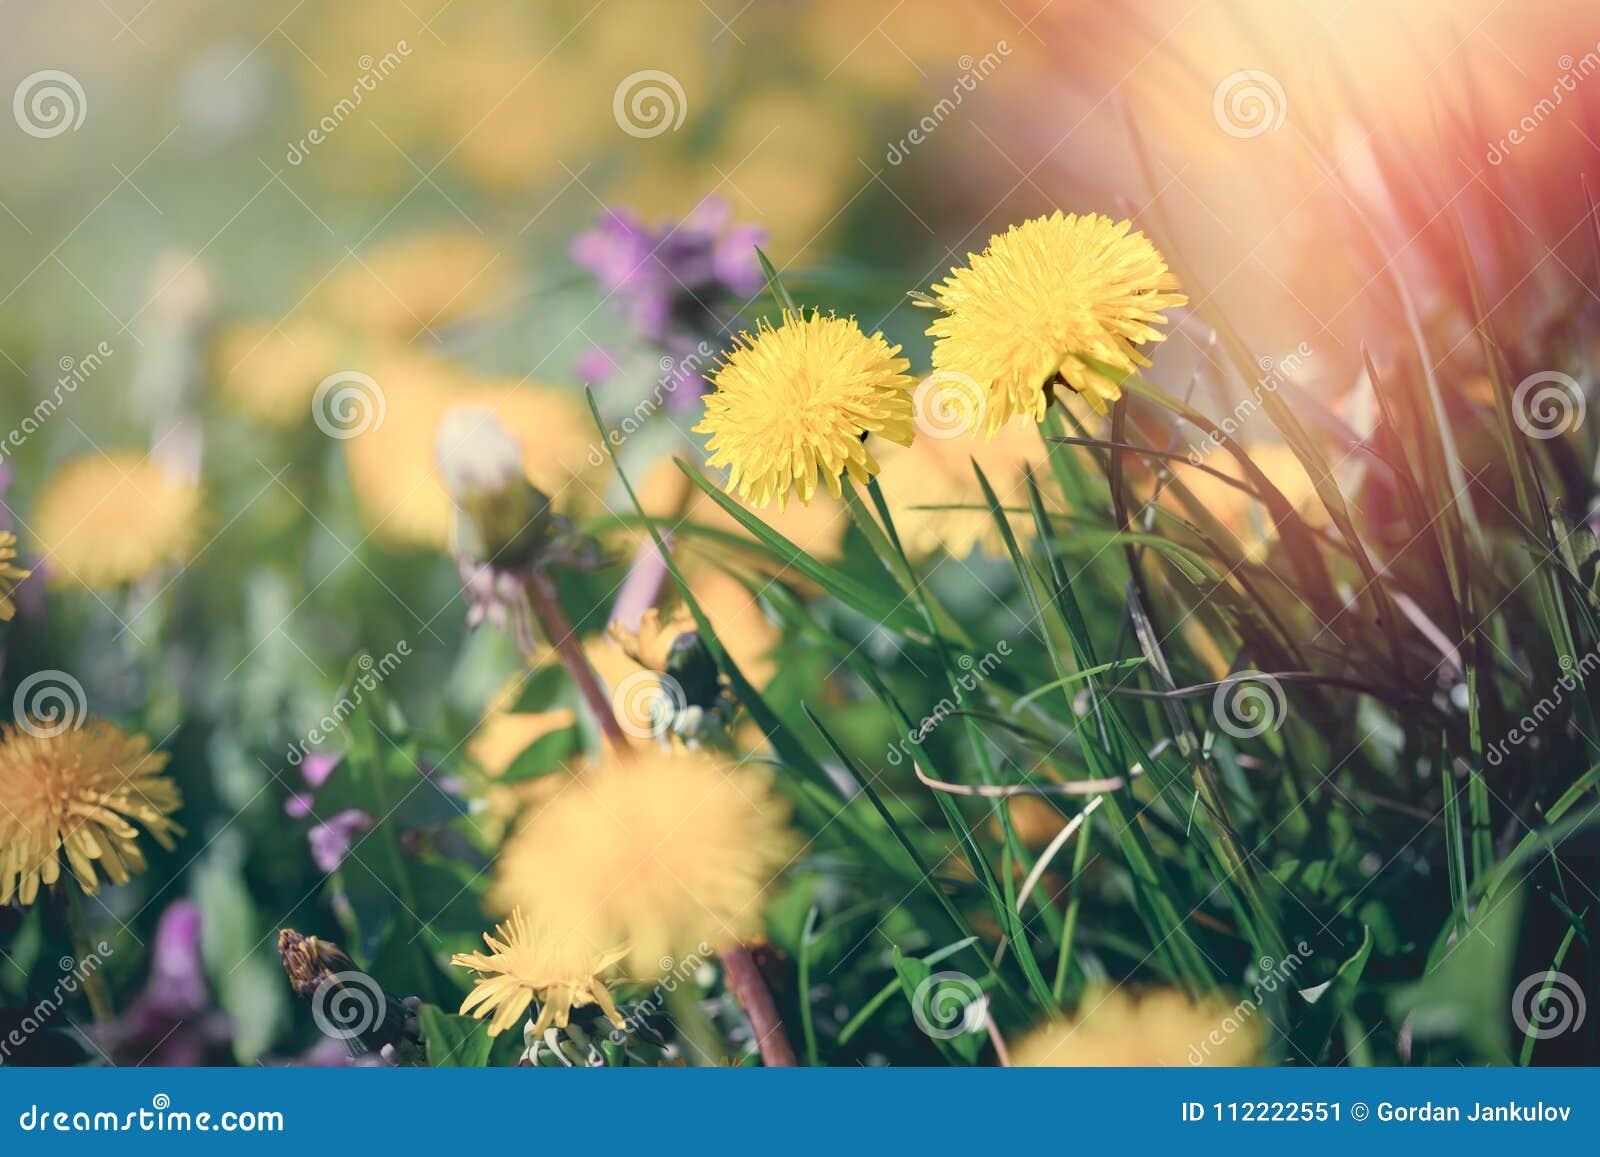 Dandelion flower in spring flowering dandelion flowers stock image royalty free stock photo izmirmasajfo